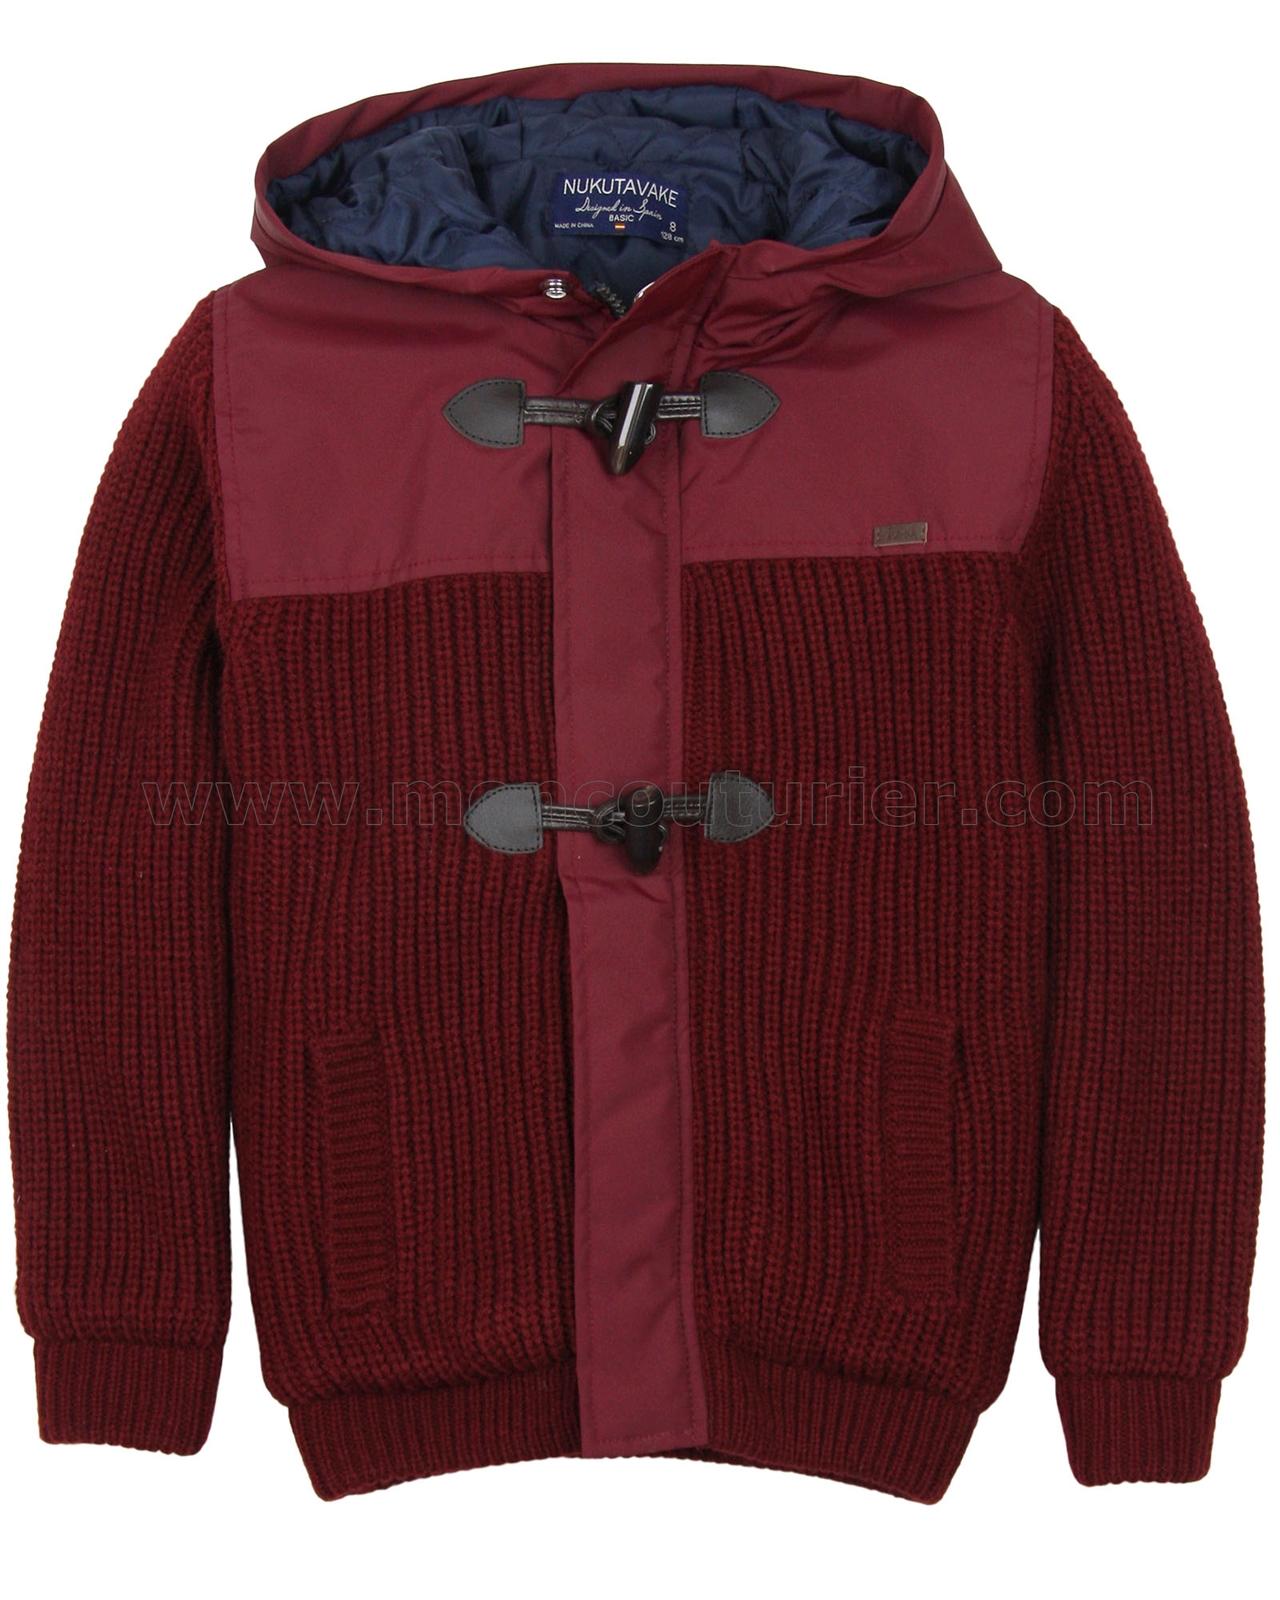 Knitting Jacket For Boy : Mayoral junior boy s hooded knit jacket